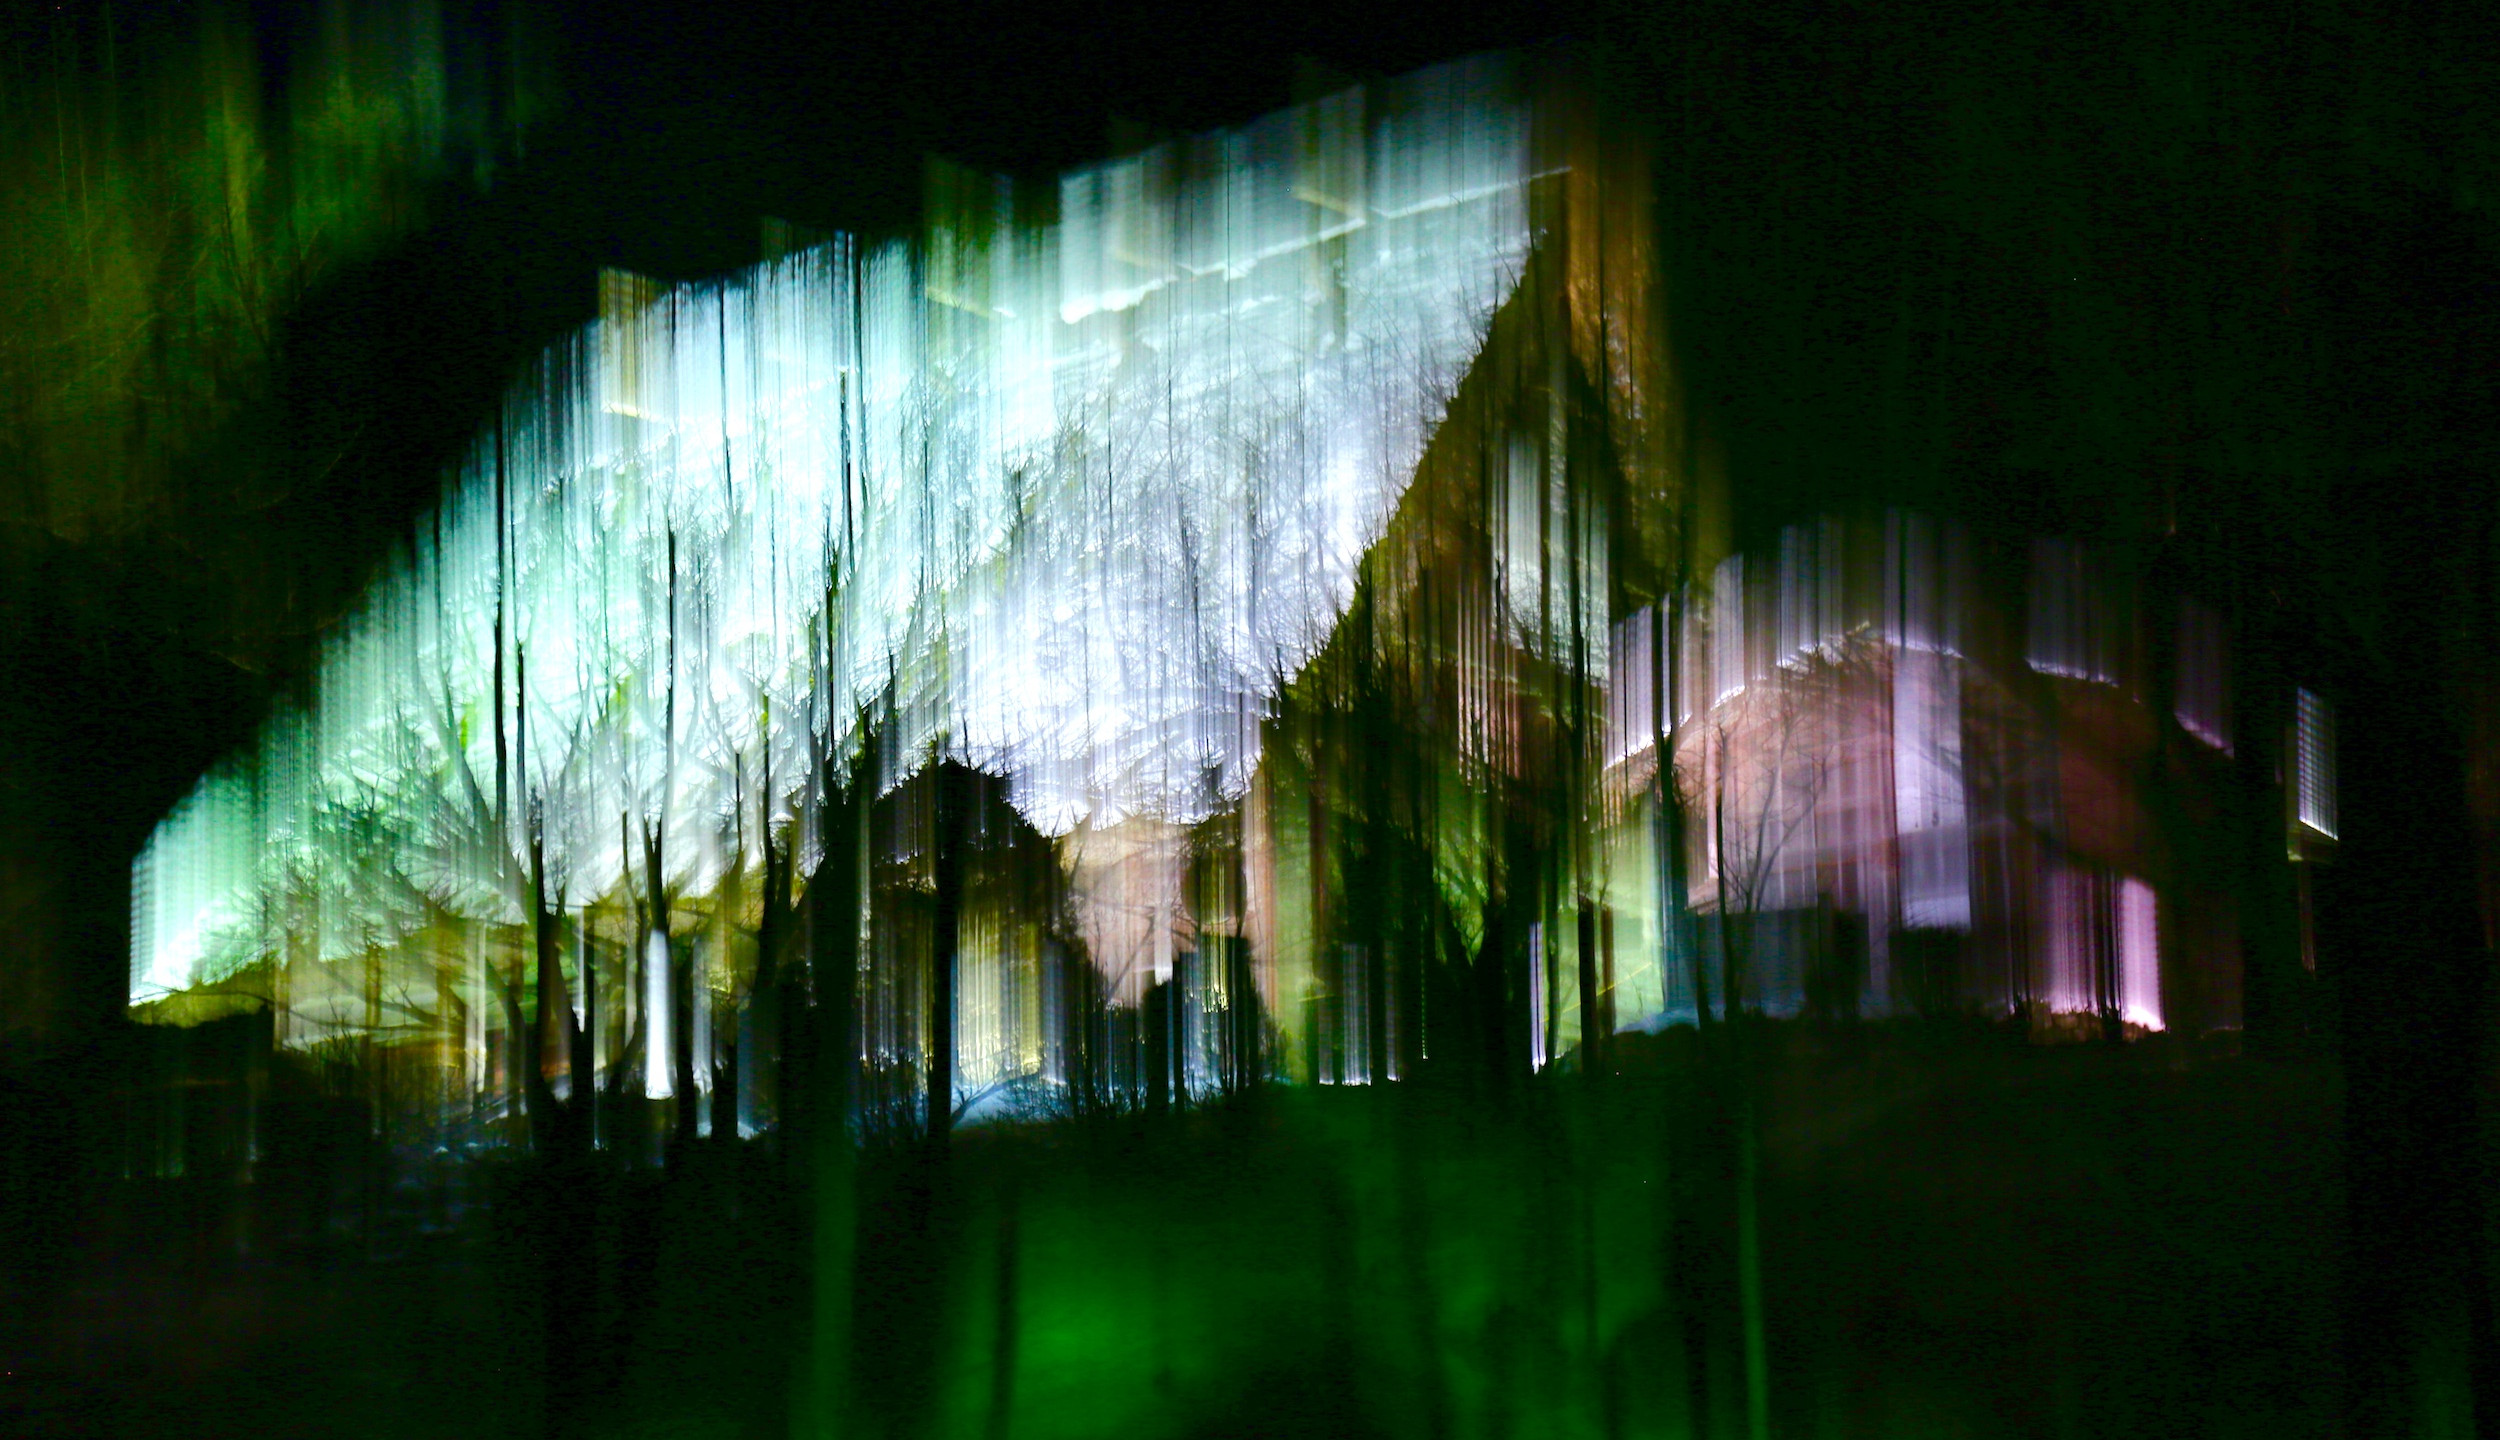 Iluminação noturna no Hida Folk Museum.